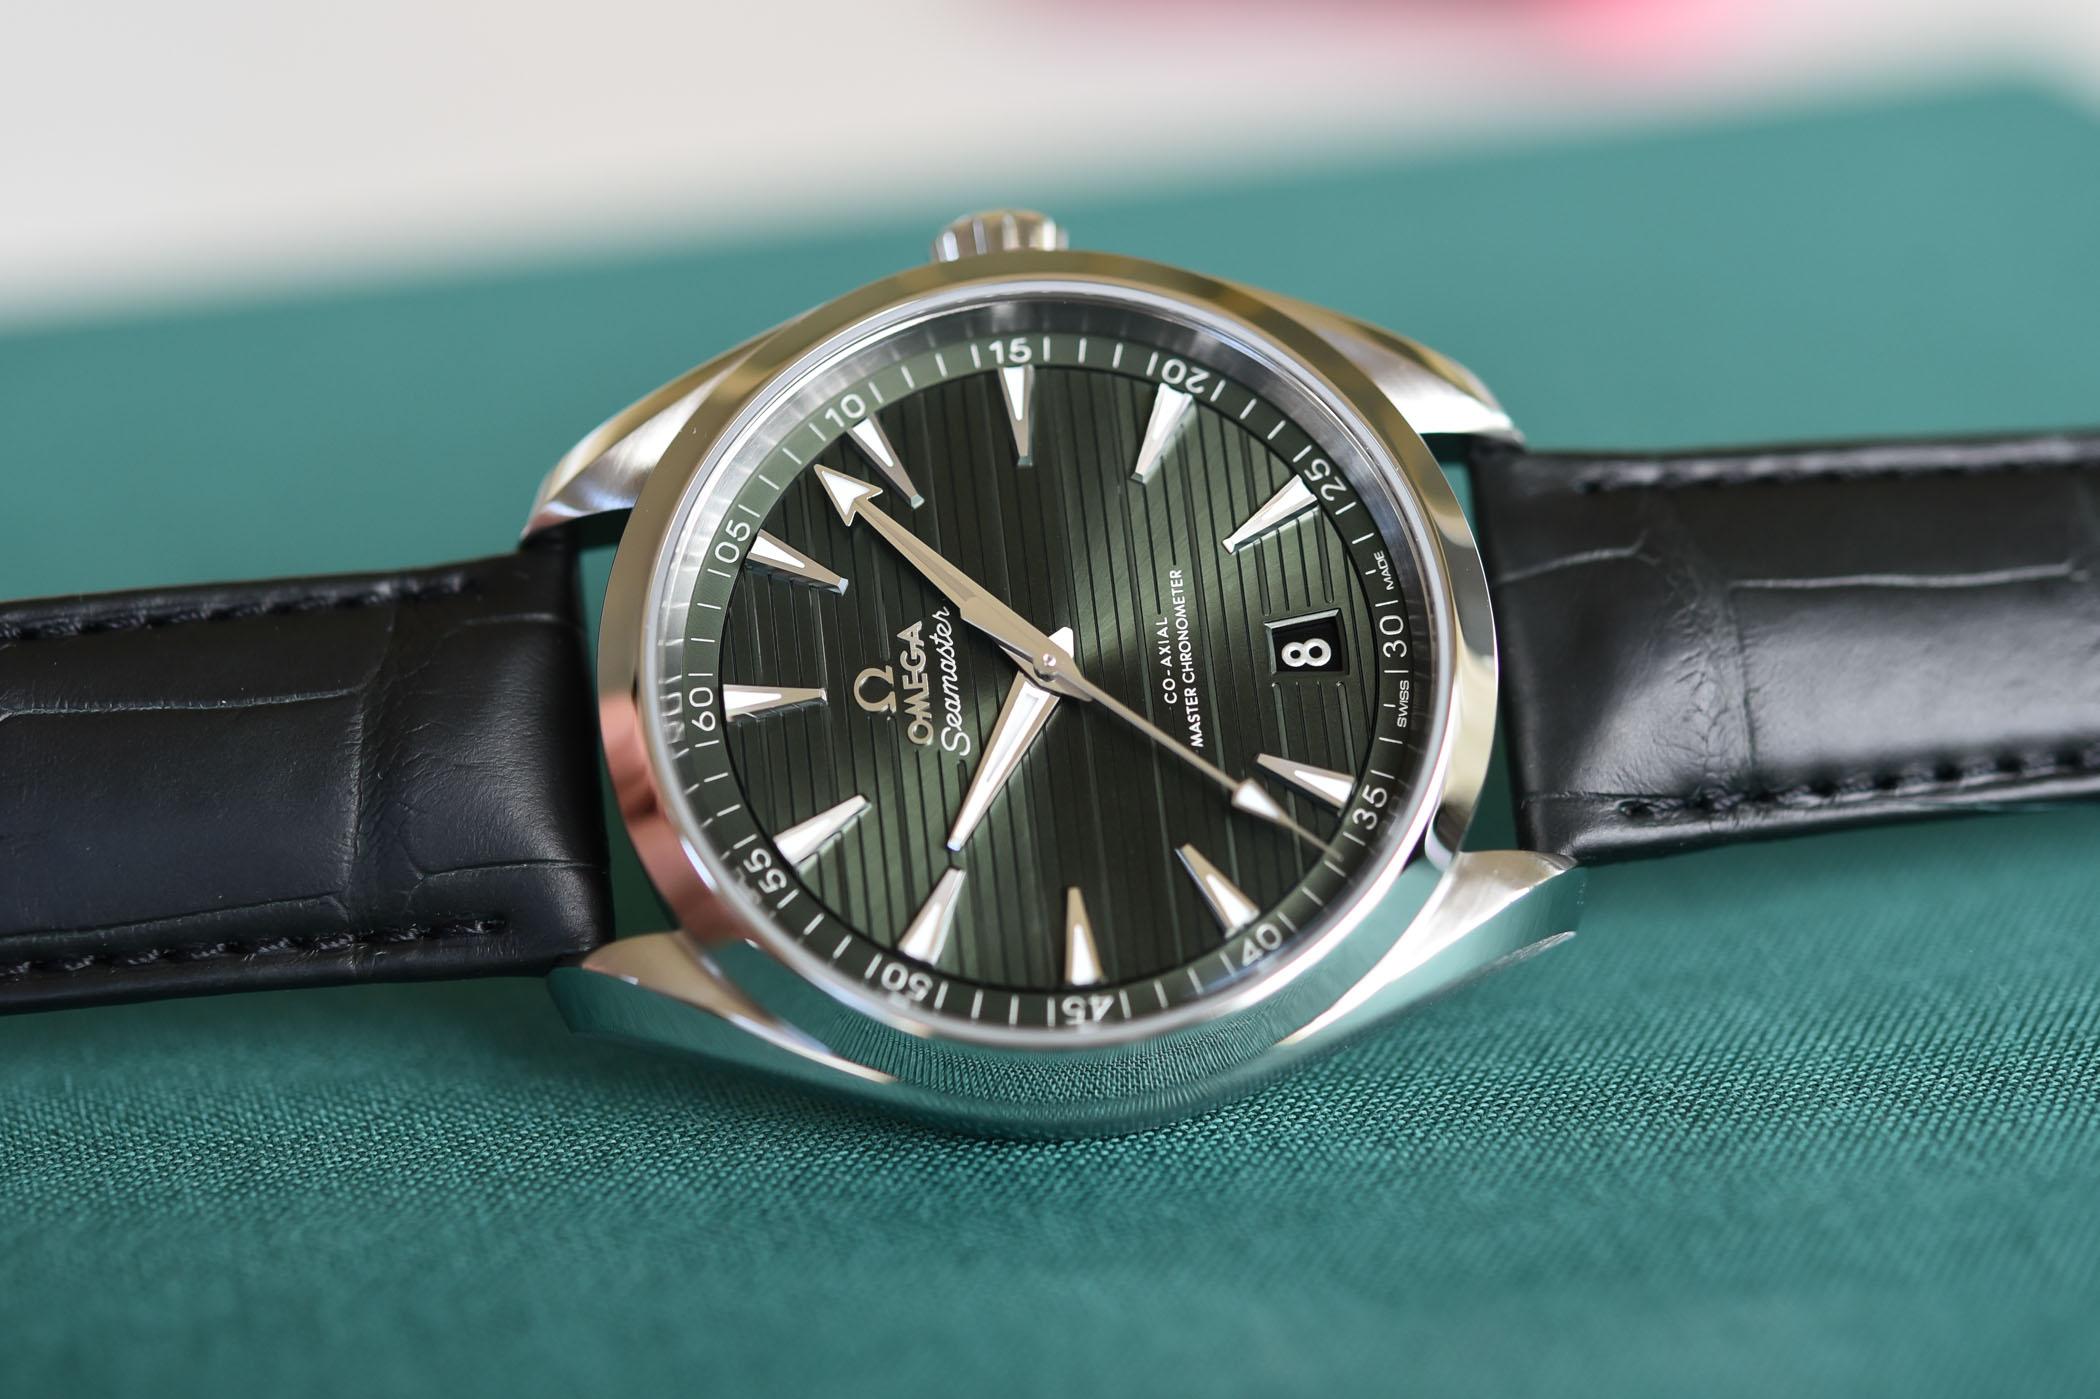 Omega Seamaster Aqua Terra 150m Master Chronometer 41mm Green Dial - 220.13.41.21.10.001